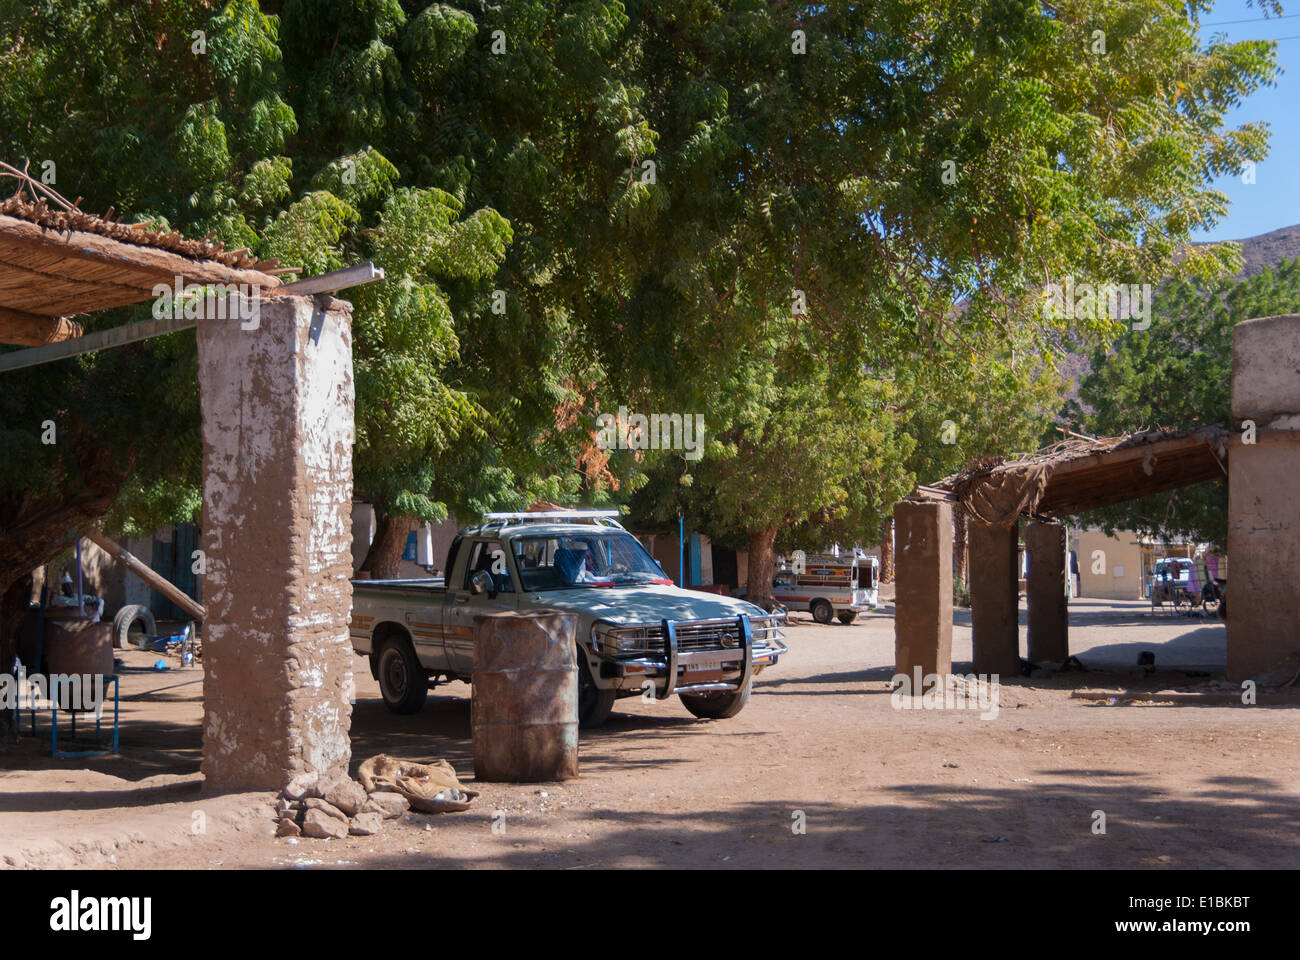 Sudan Souq Stock Photos & Sudan Souq Stock Images - Alamy